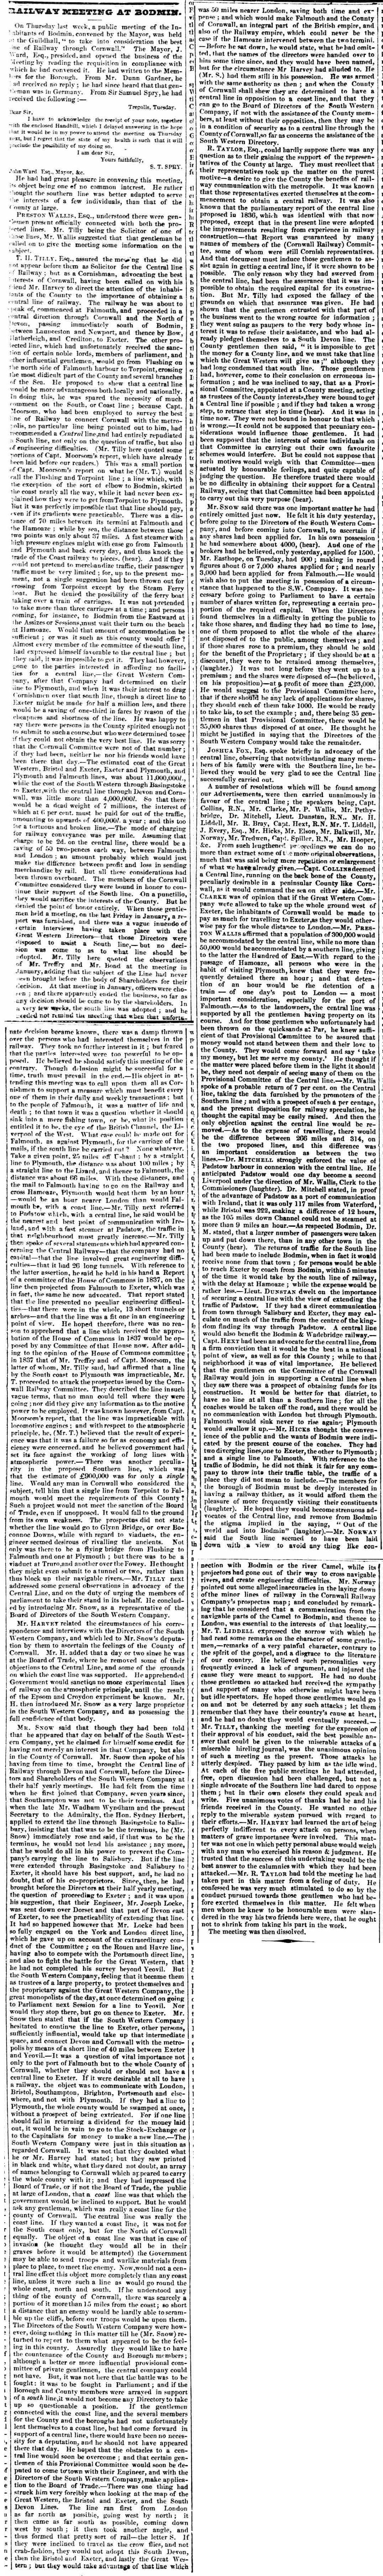 Bodmin Meeting 01 November 1844